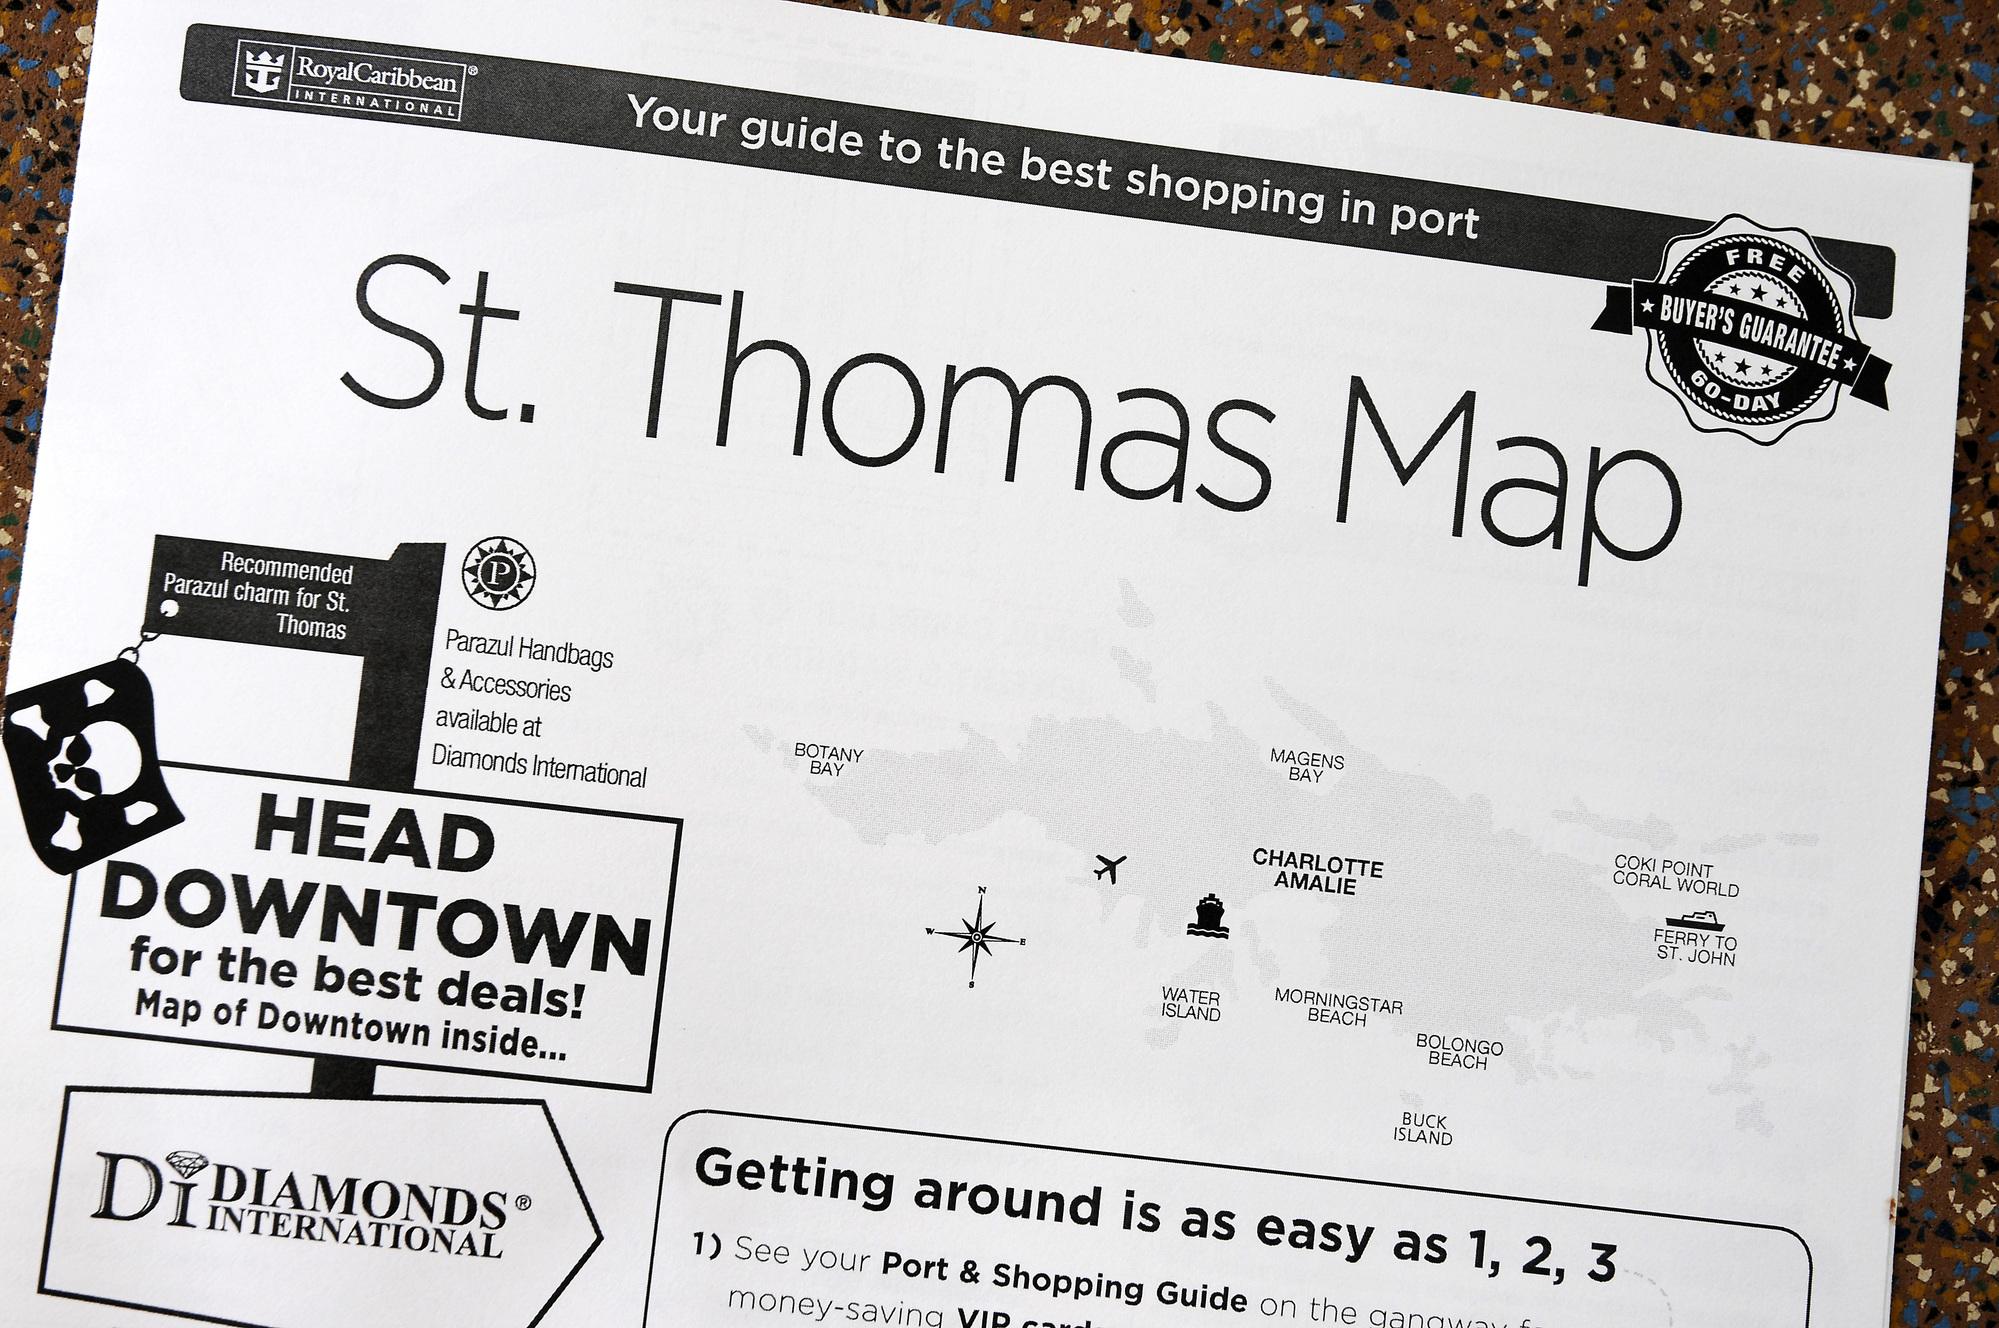 Charlotte Amalie - City Map (1) | St. Thomas (Virgin Islands ...